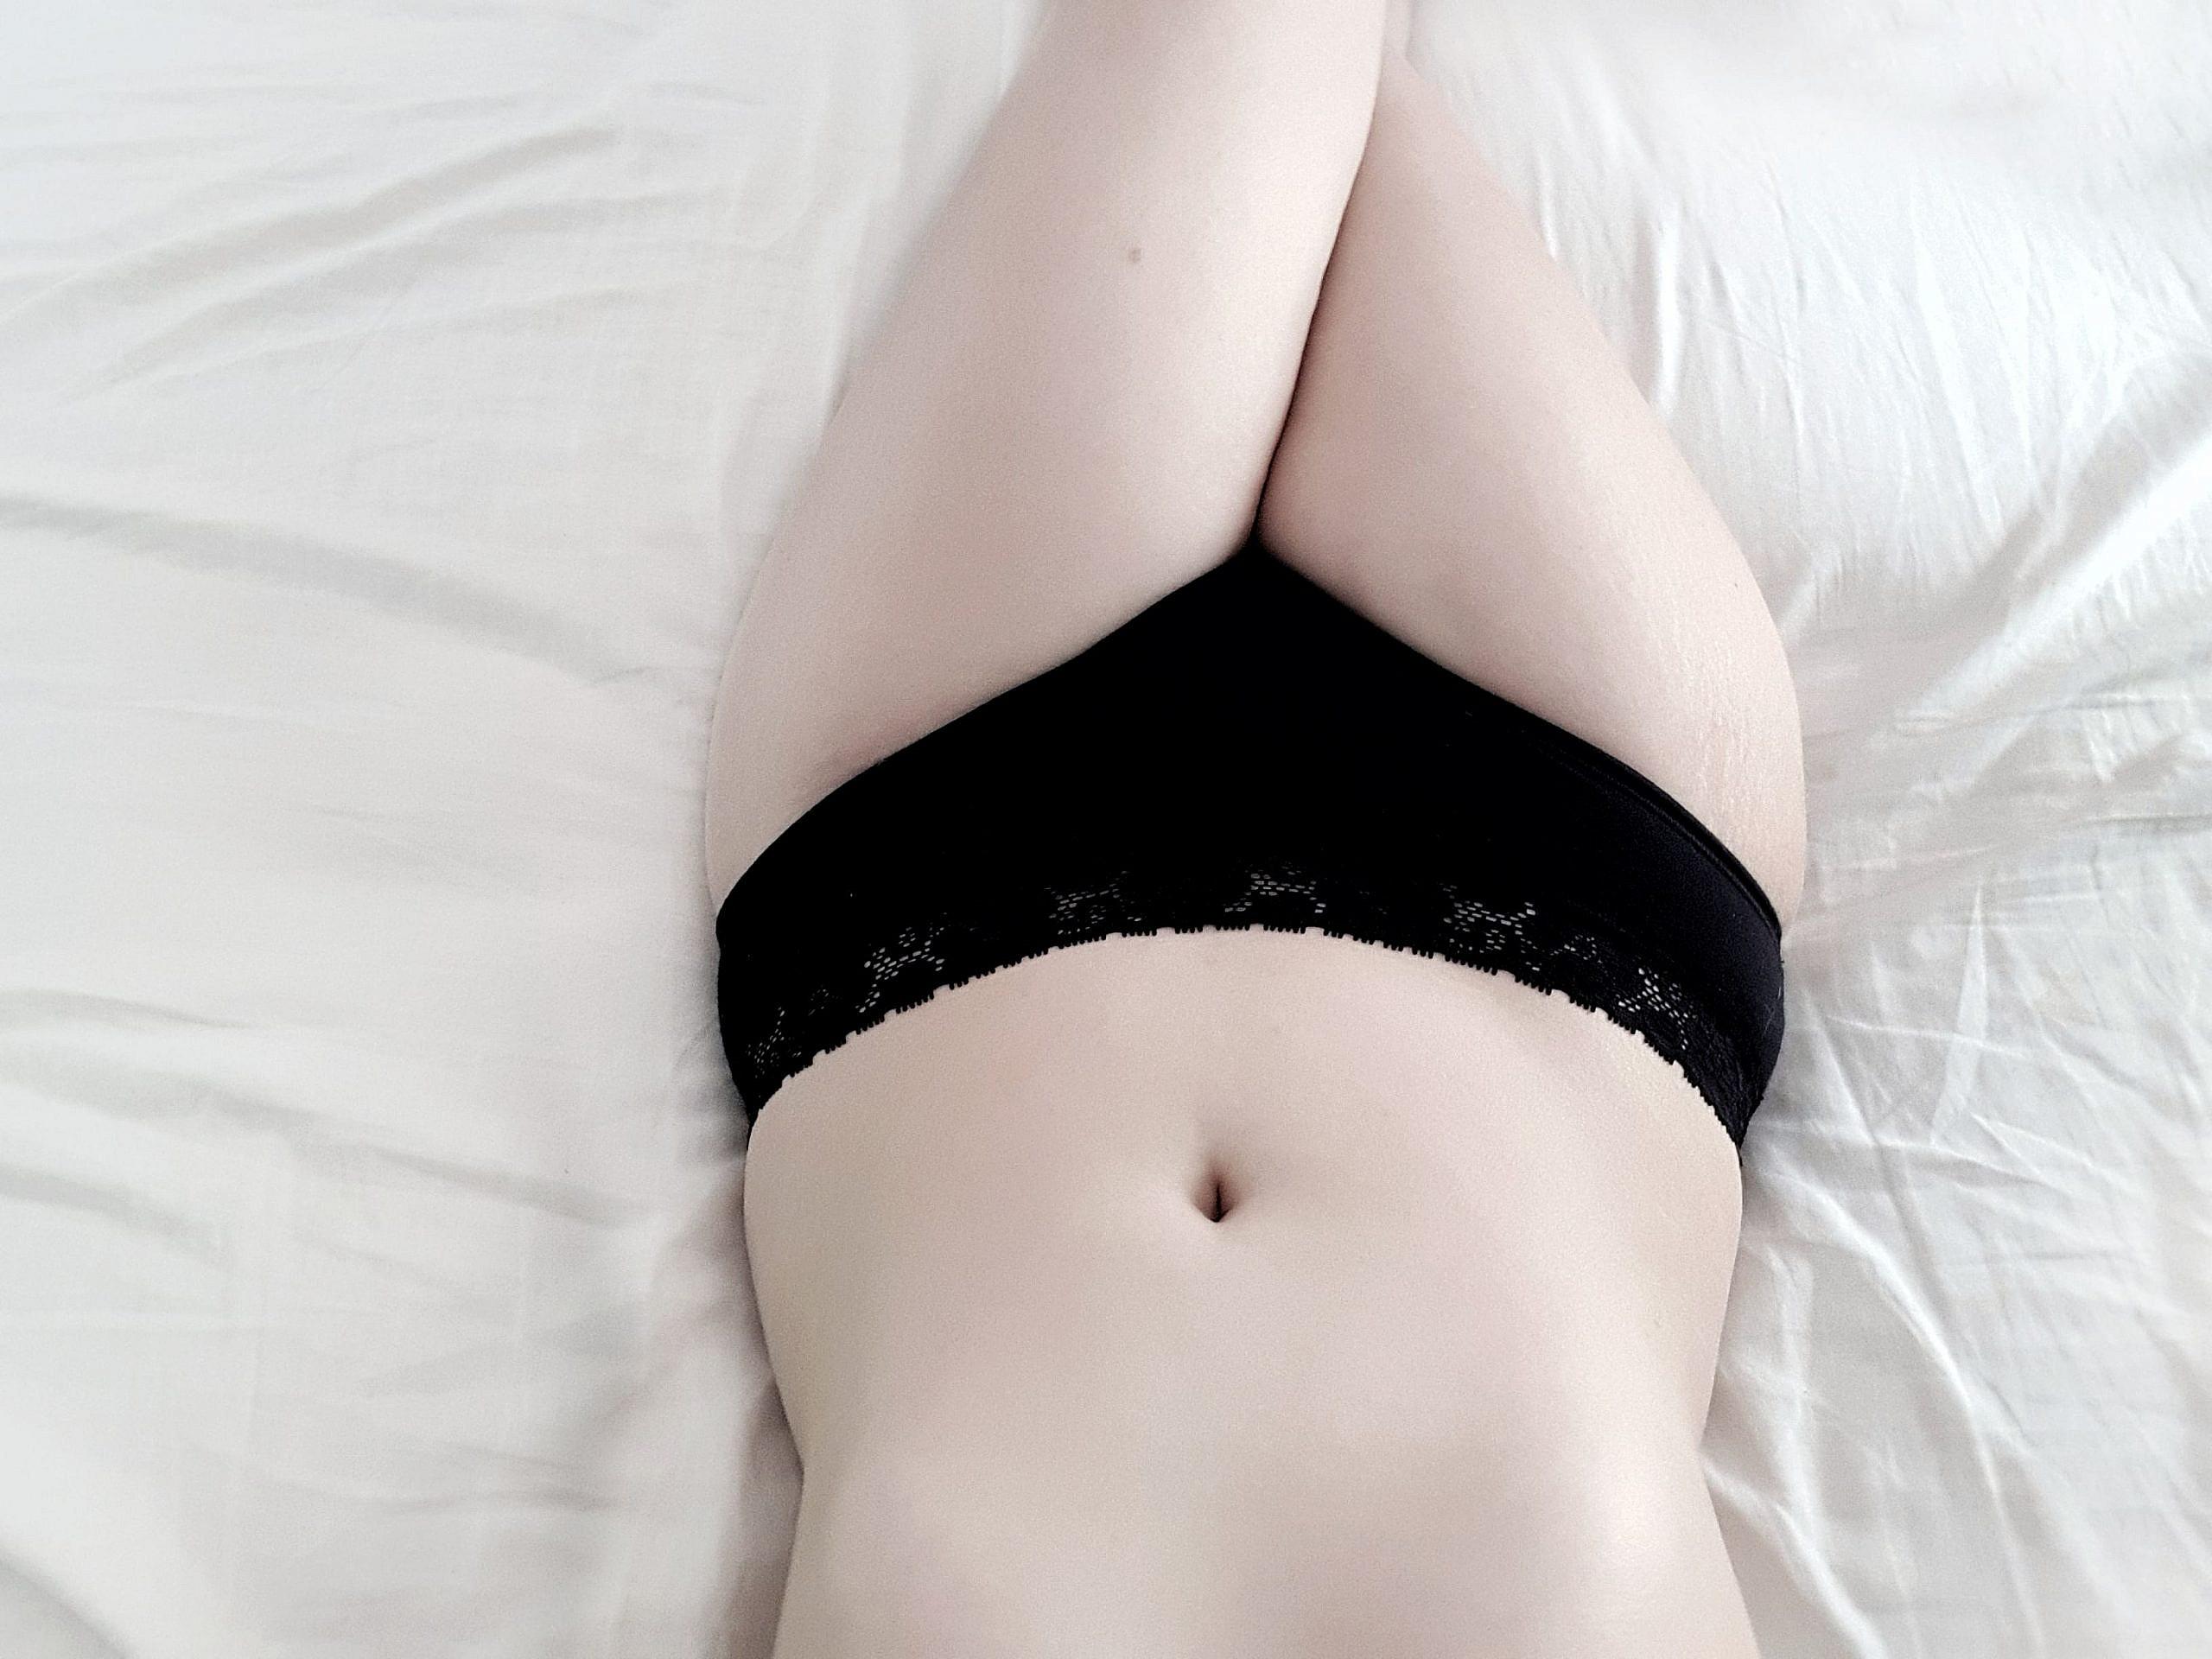 avis-socup-culotte-menstruelle-gallica